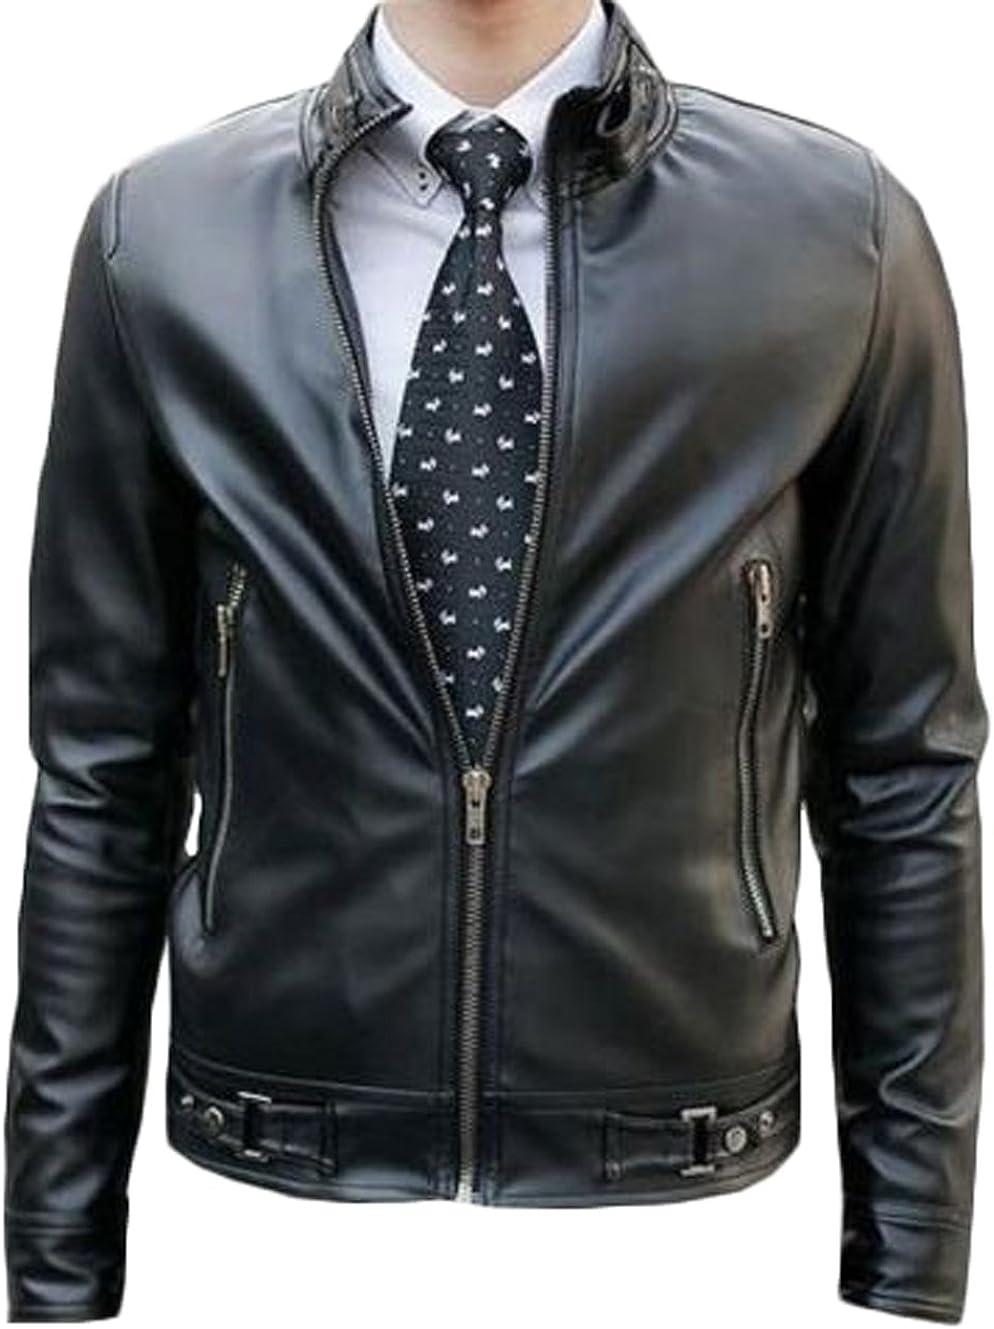 Men Leather Jacket New Soft Lambskin Slim Biker Bomber Coat T1335